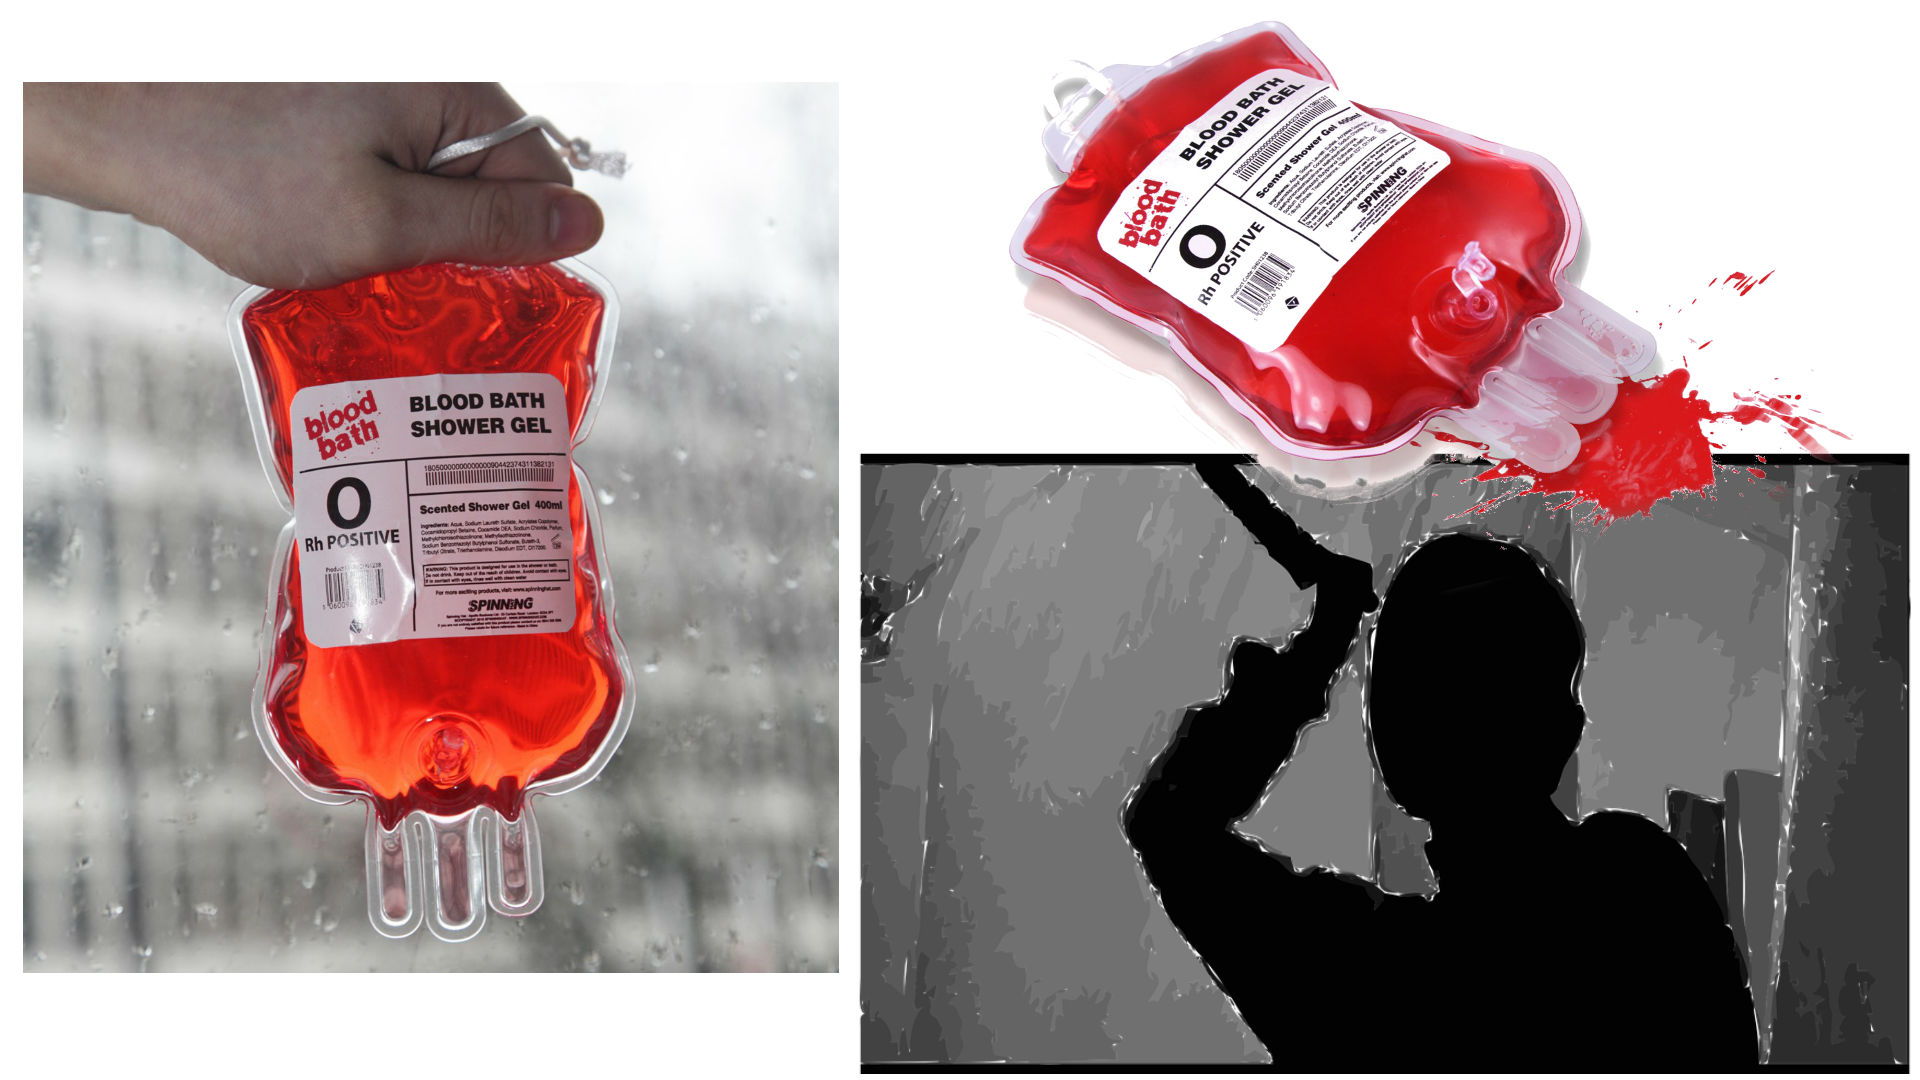 gel_de_ducha_bolsa_de_sangre.jpg